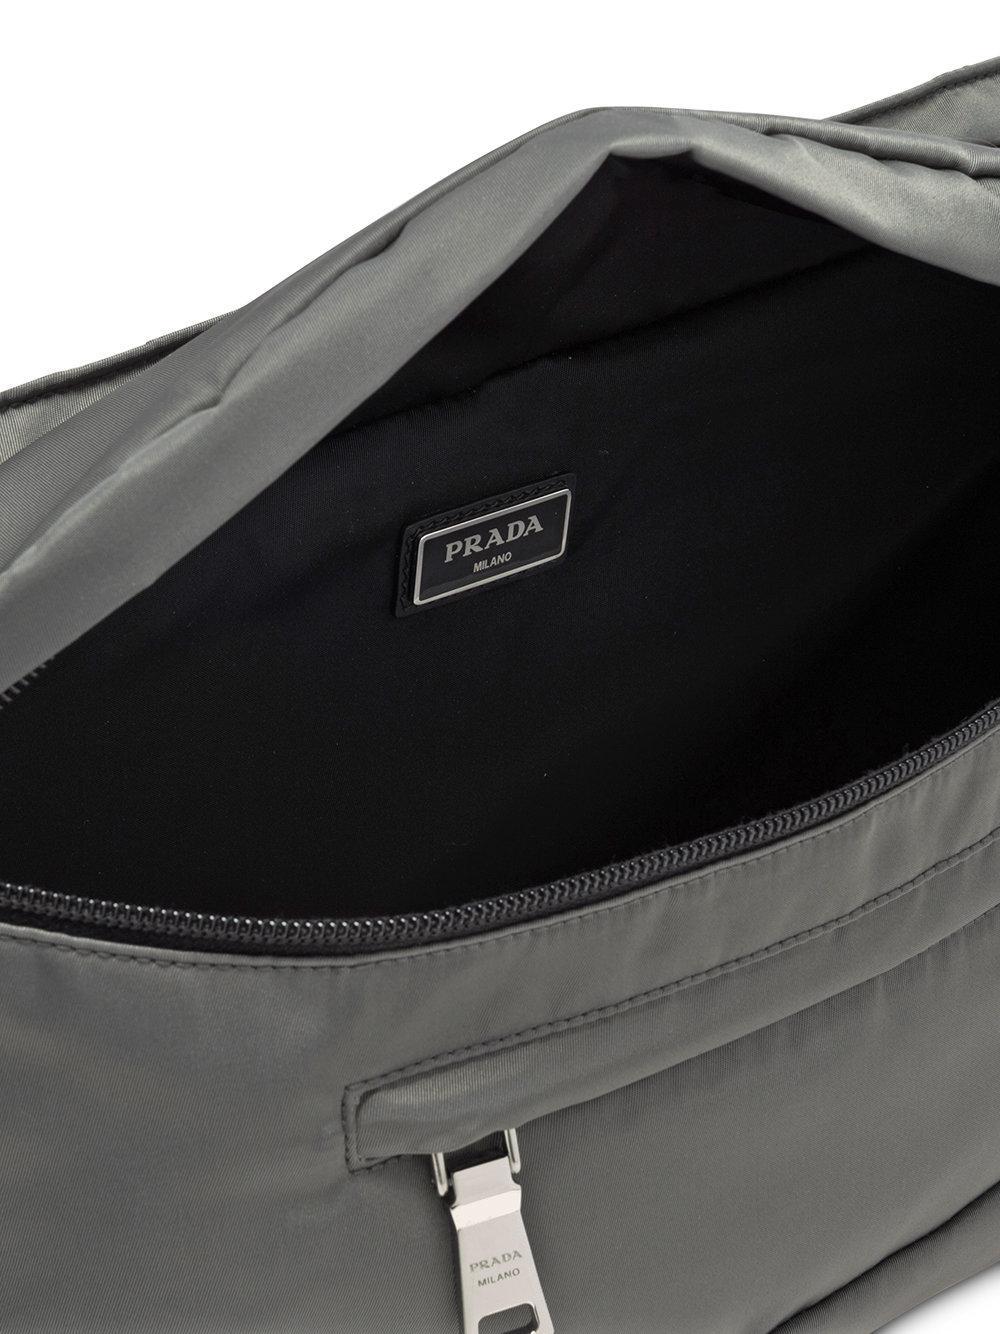 44b0d92afcf3 ... ebay prada gray trio compartment belt bag for men lyst. view fullscreen  51183 ef741